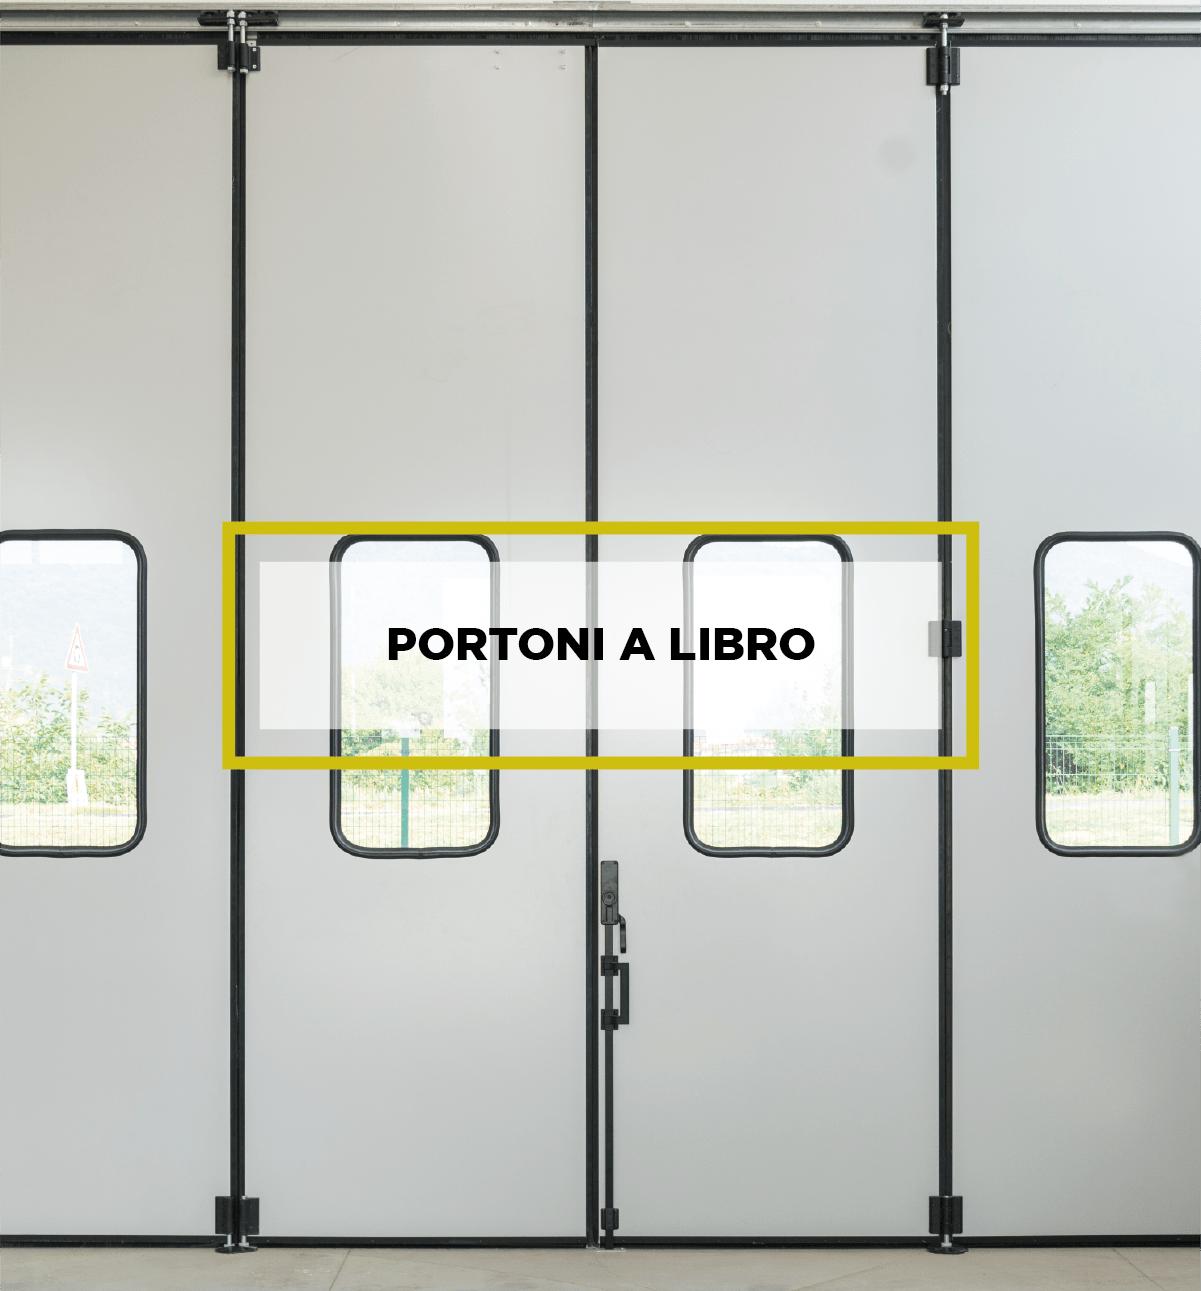 Portoni Industriali a libro Iridium Doors